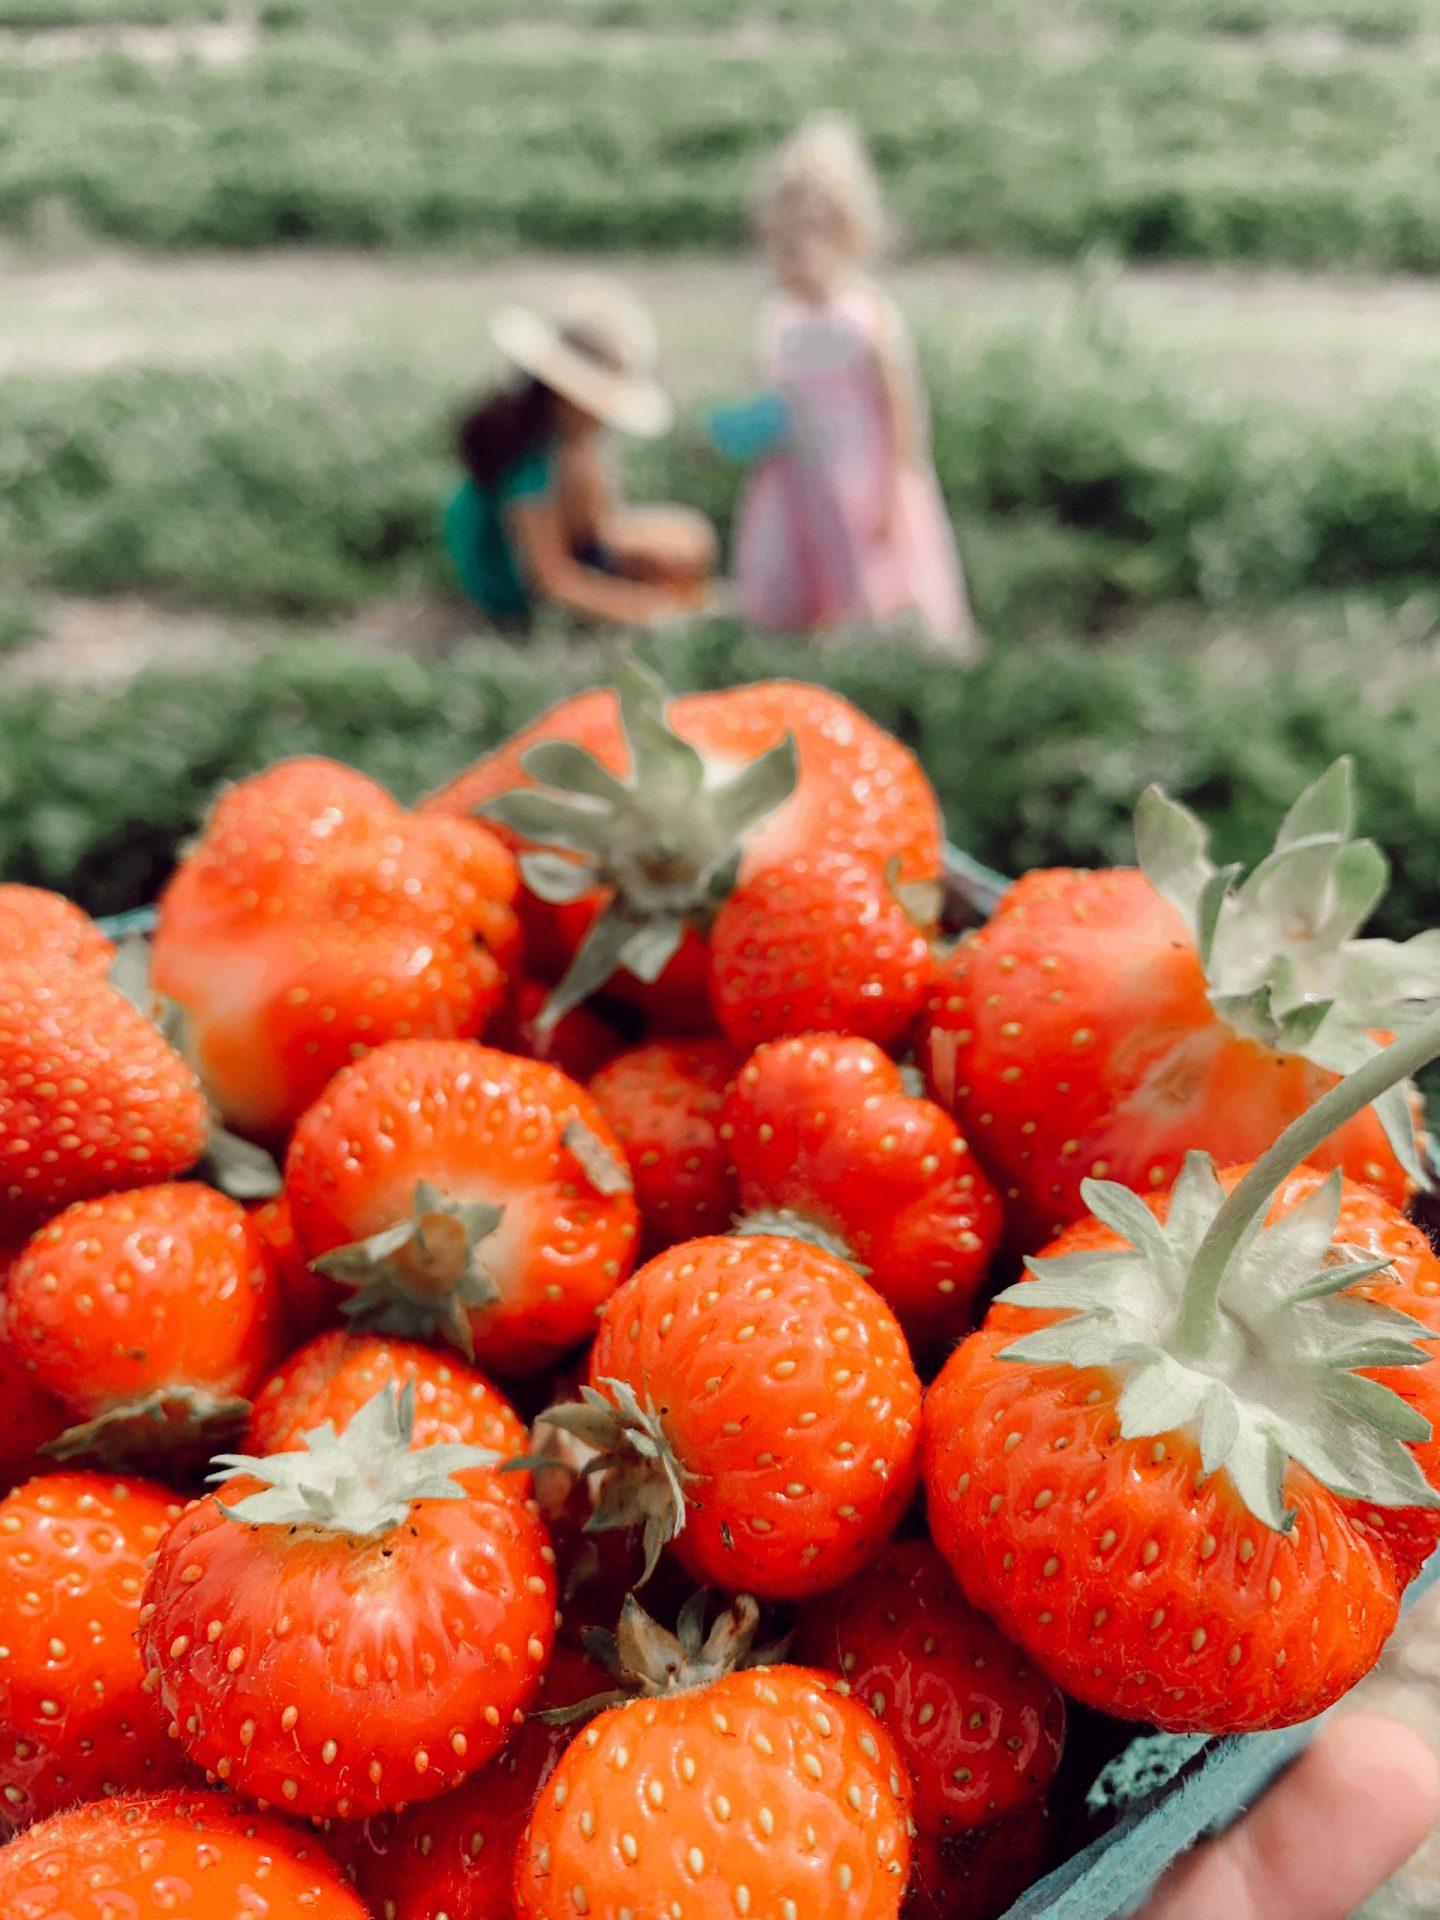 Linvilla Orchards: Visit Guide